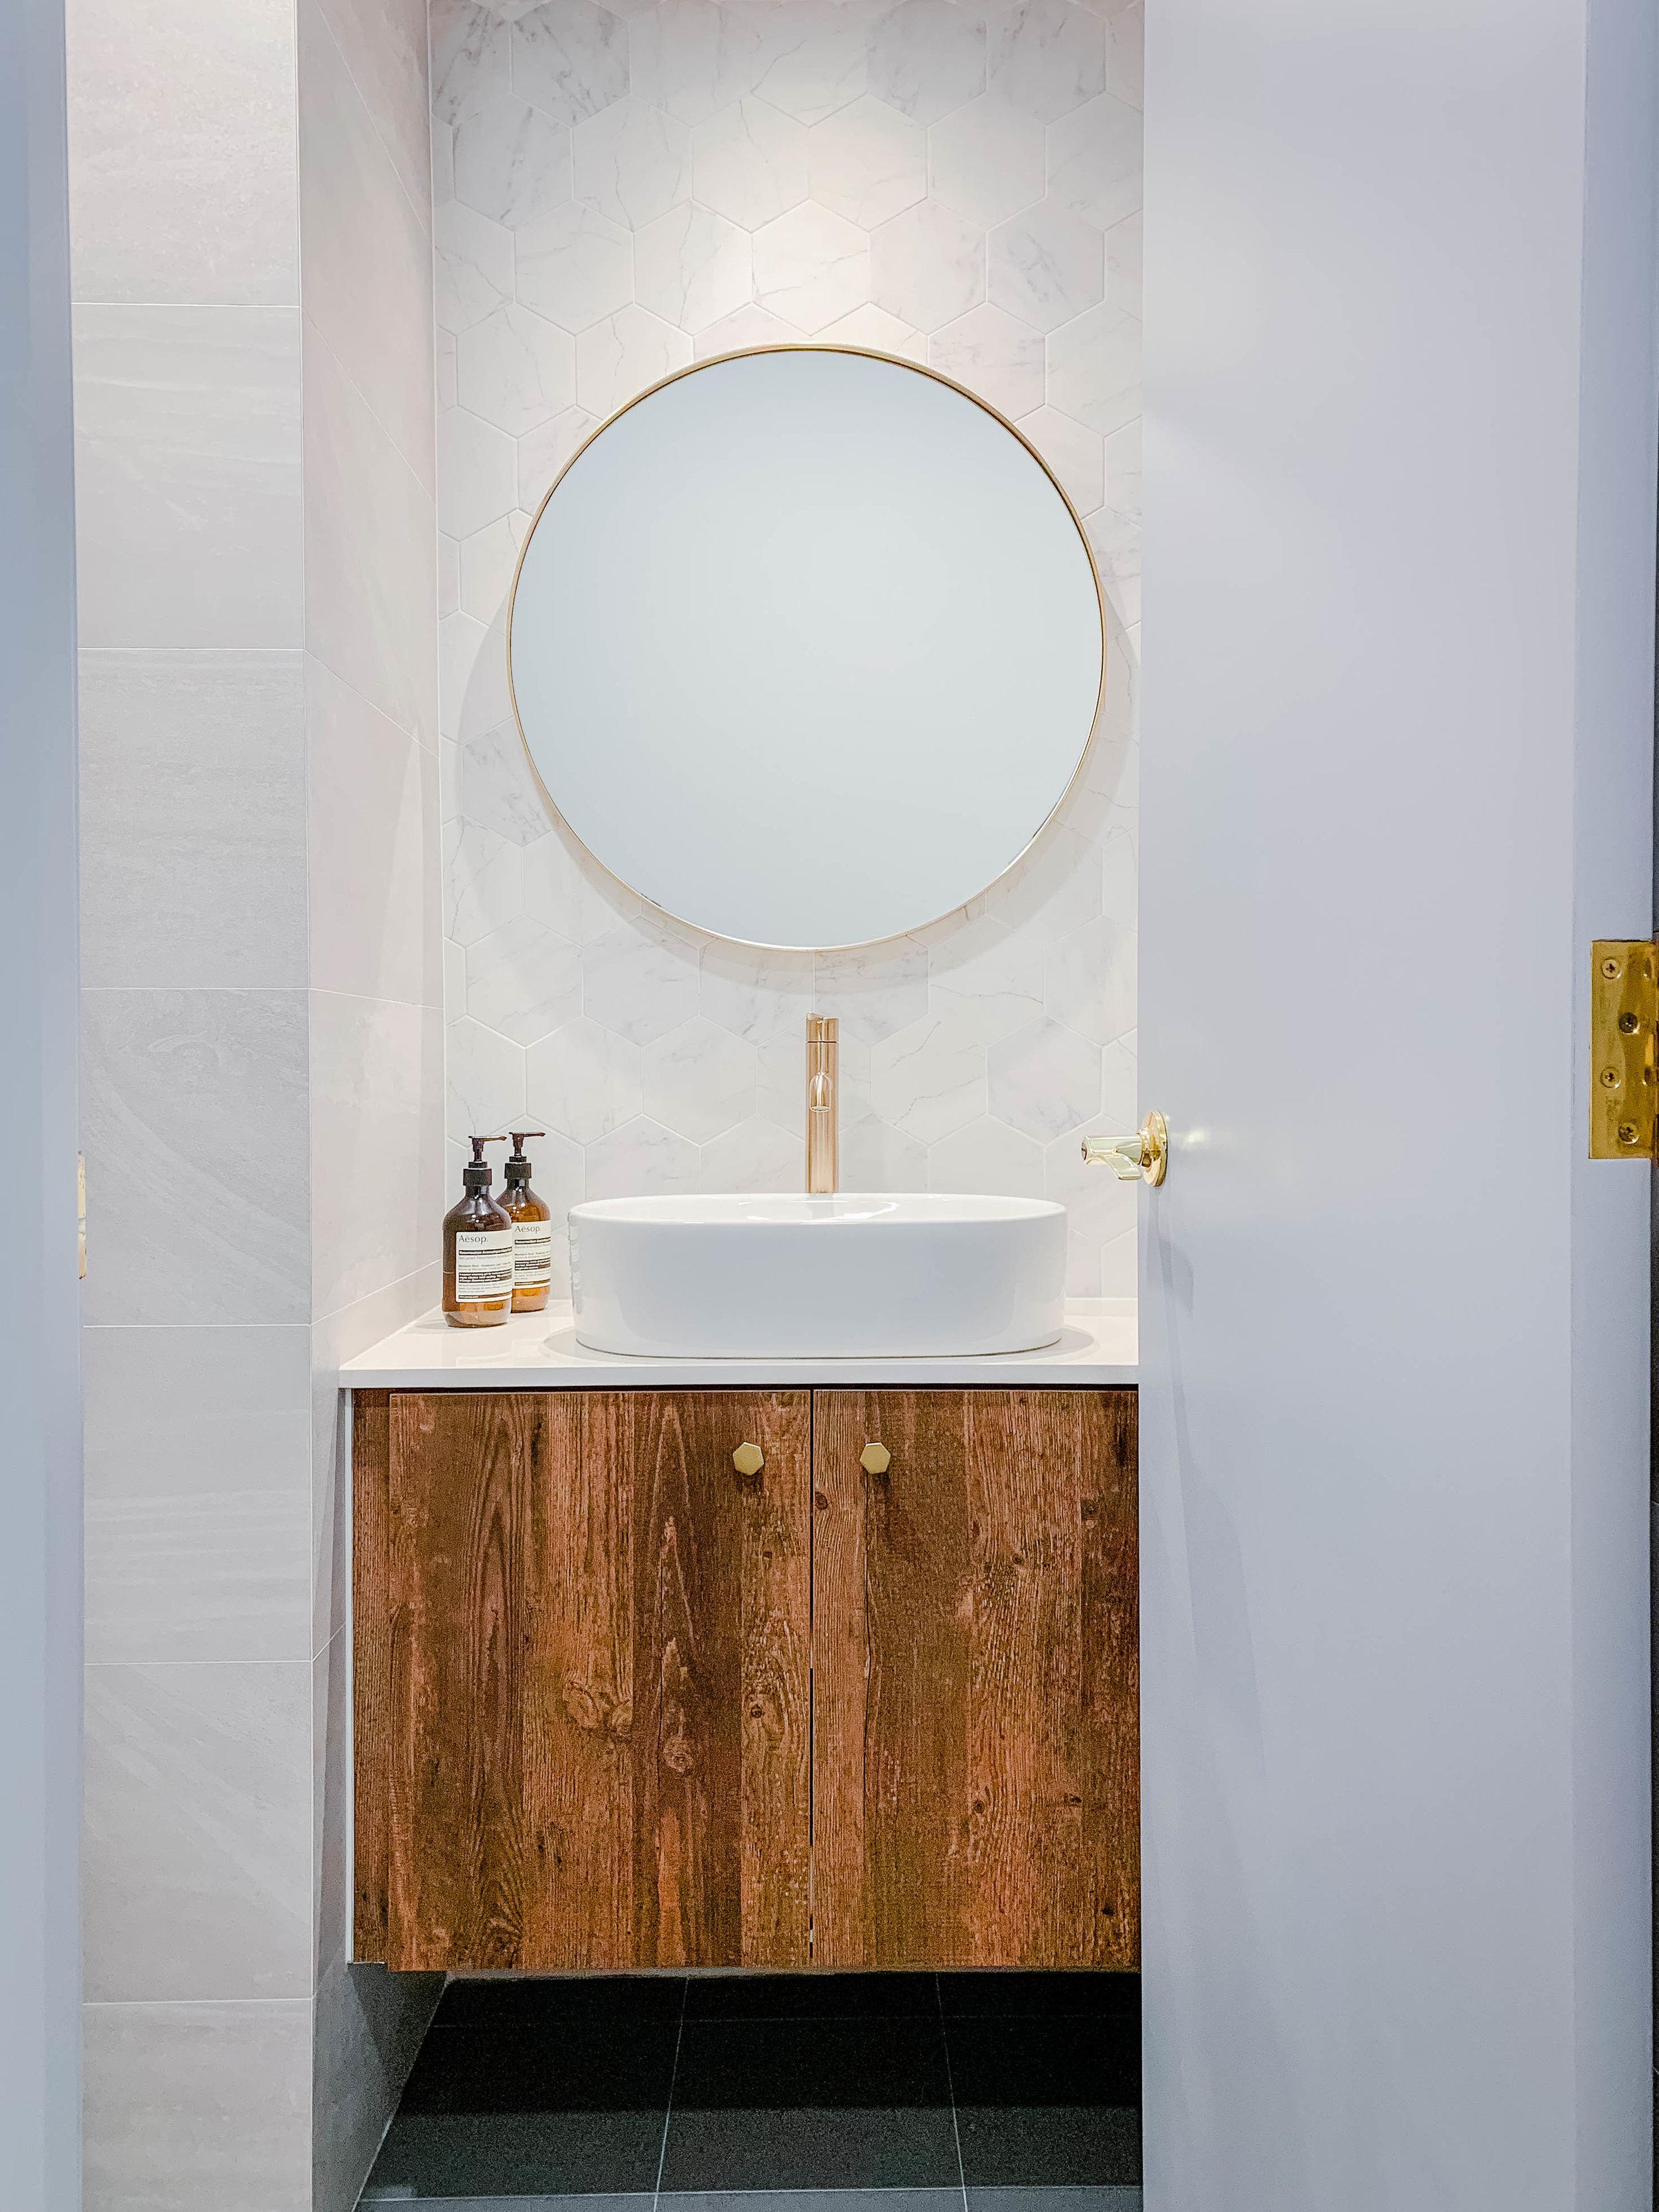 Urban Home Makeover Design (5 of 14).jpg